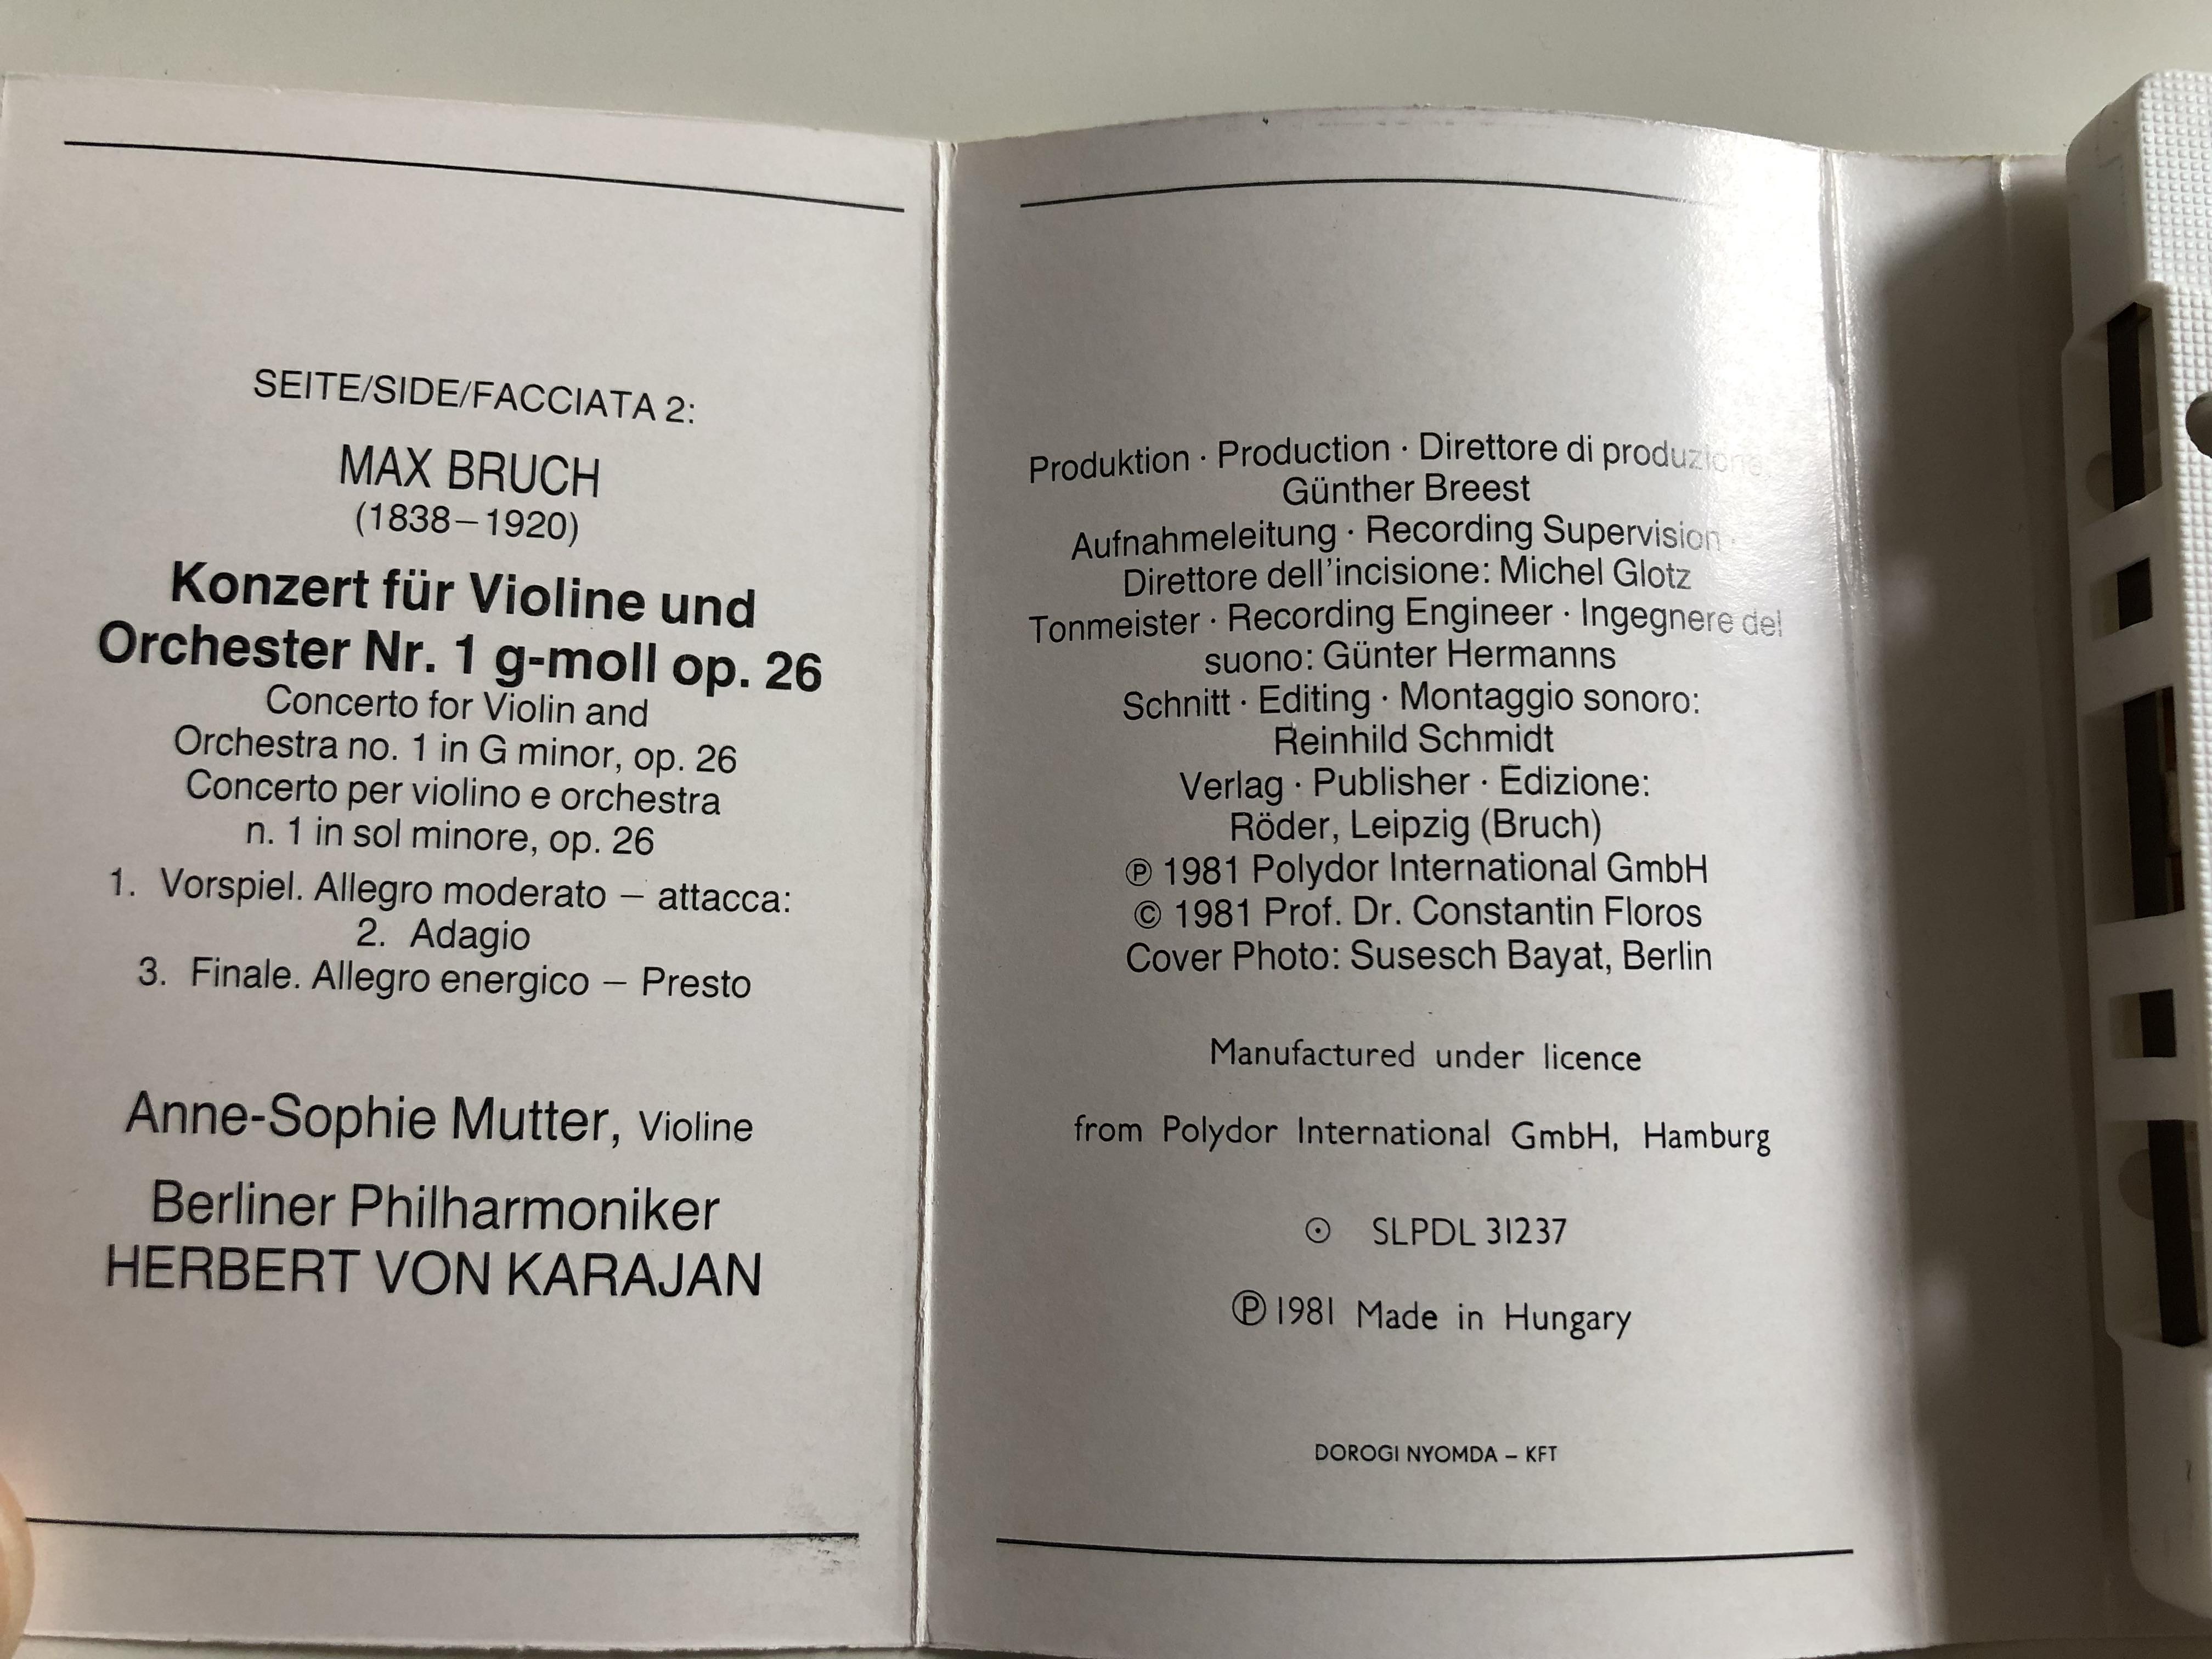 mendelssohn-bruch-violinkonzerte-anne-sophie-mutter-berliner-philharmoniker-conducted-herbert-von-karajan-deutsche-grammophon-hungaroton-cassette-stereo-mkl-31237-3-.jpg